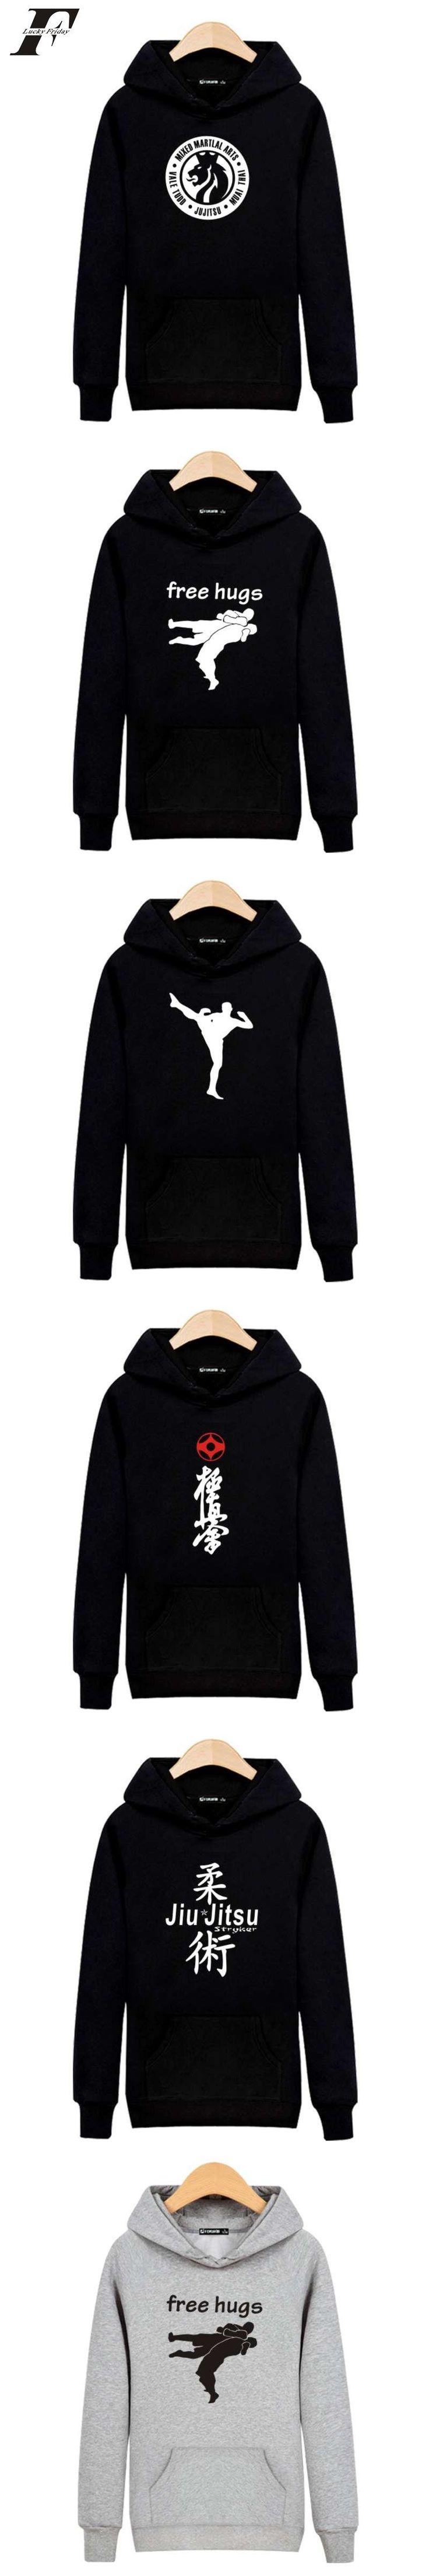 hip hop hoodies MMA JIU JITSU Hooded printed Hoodie sweatshirt Streetwear MMA moletom masculino men clothing tracksuit sudadera